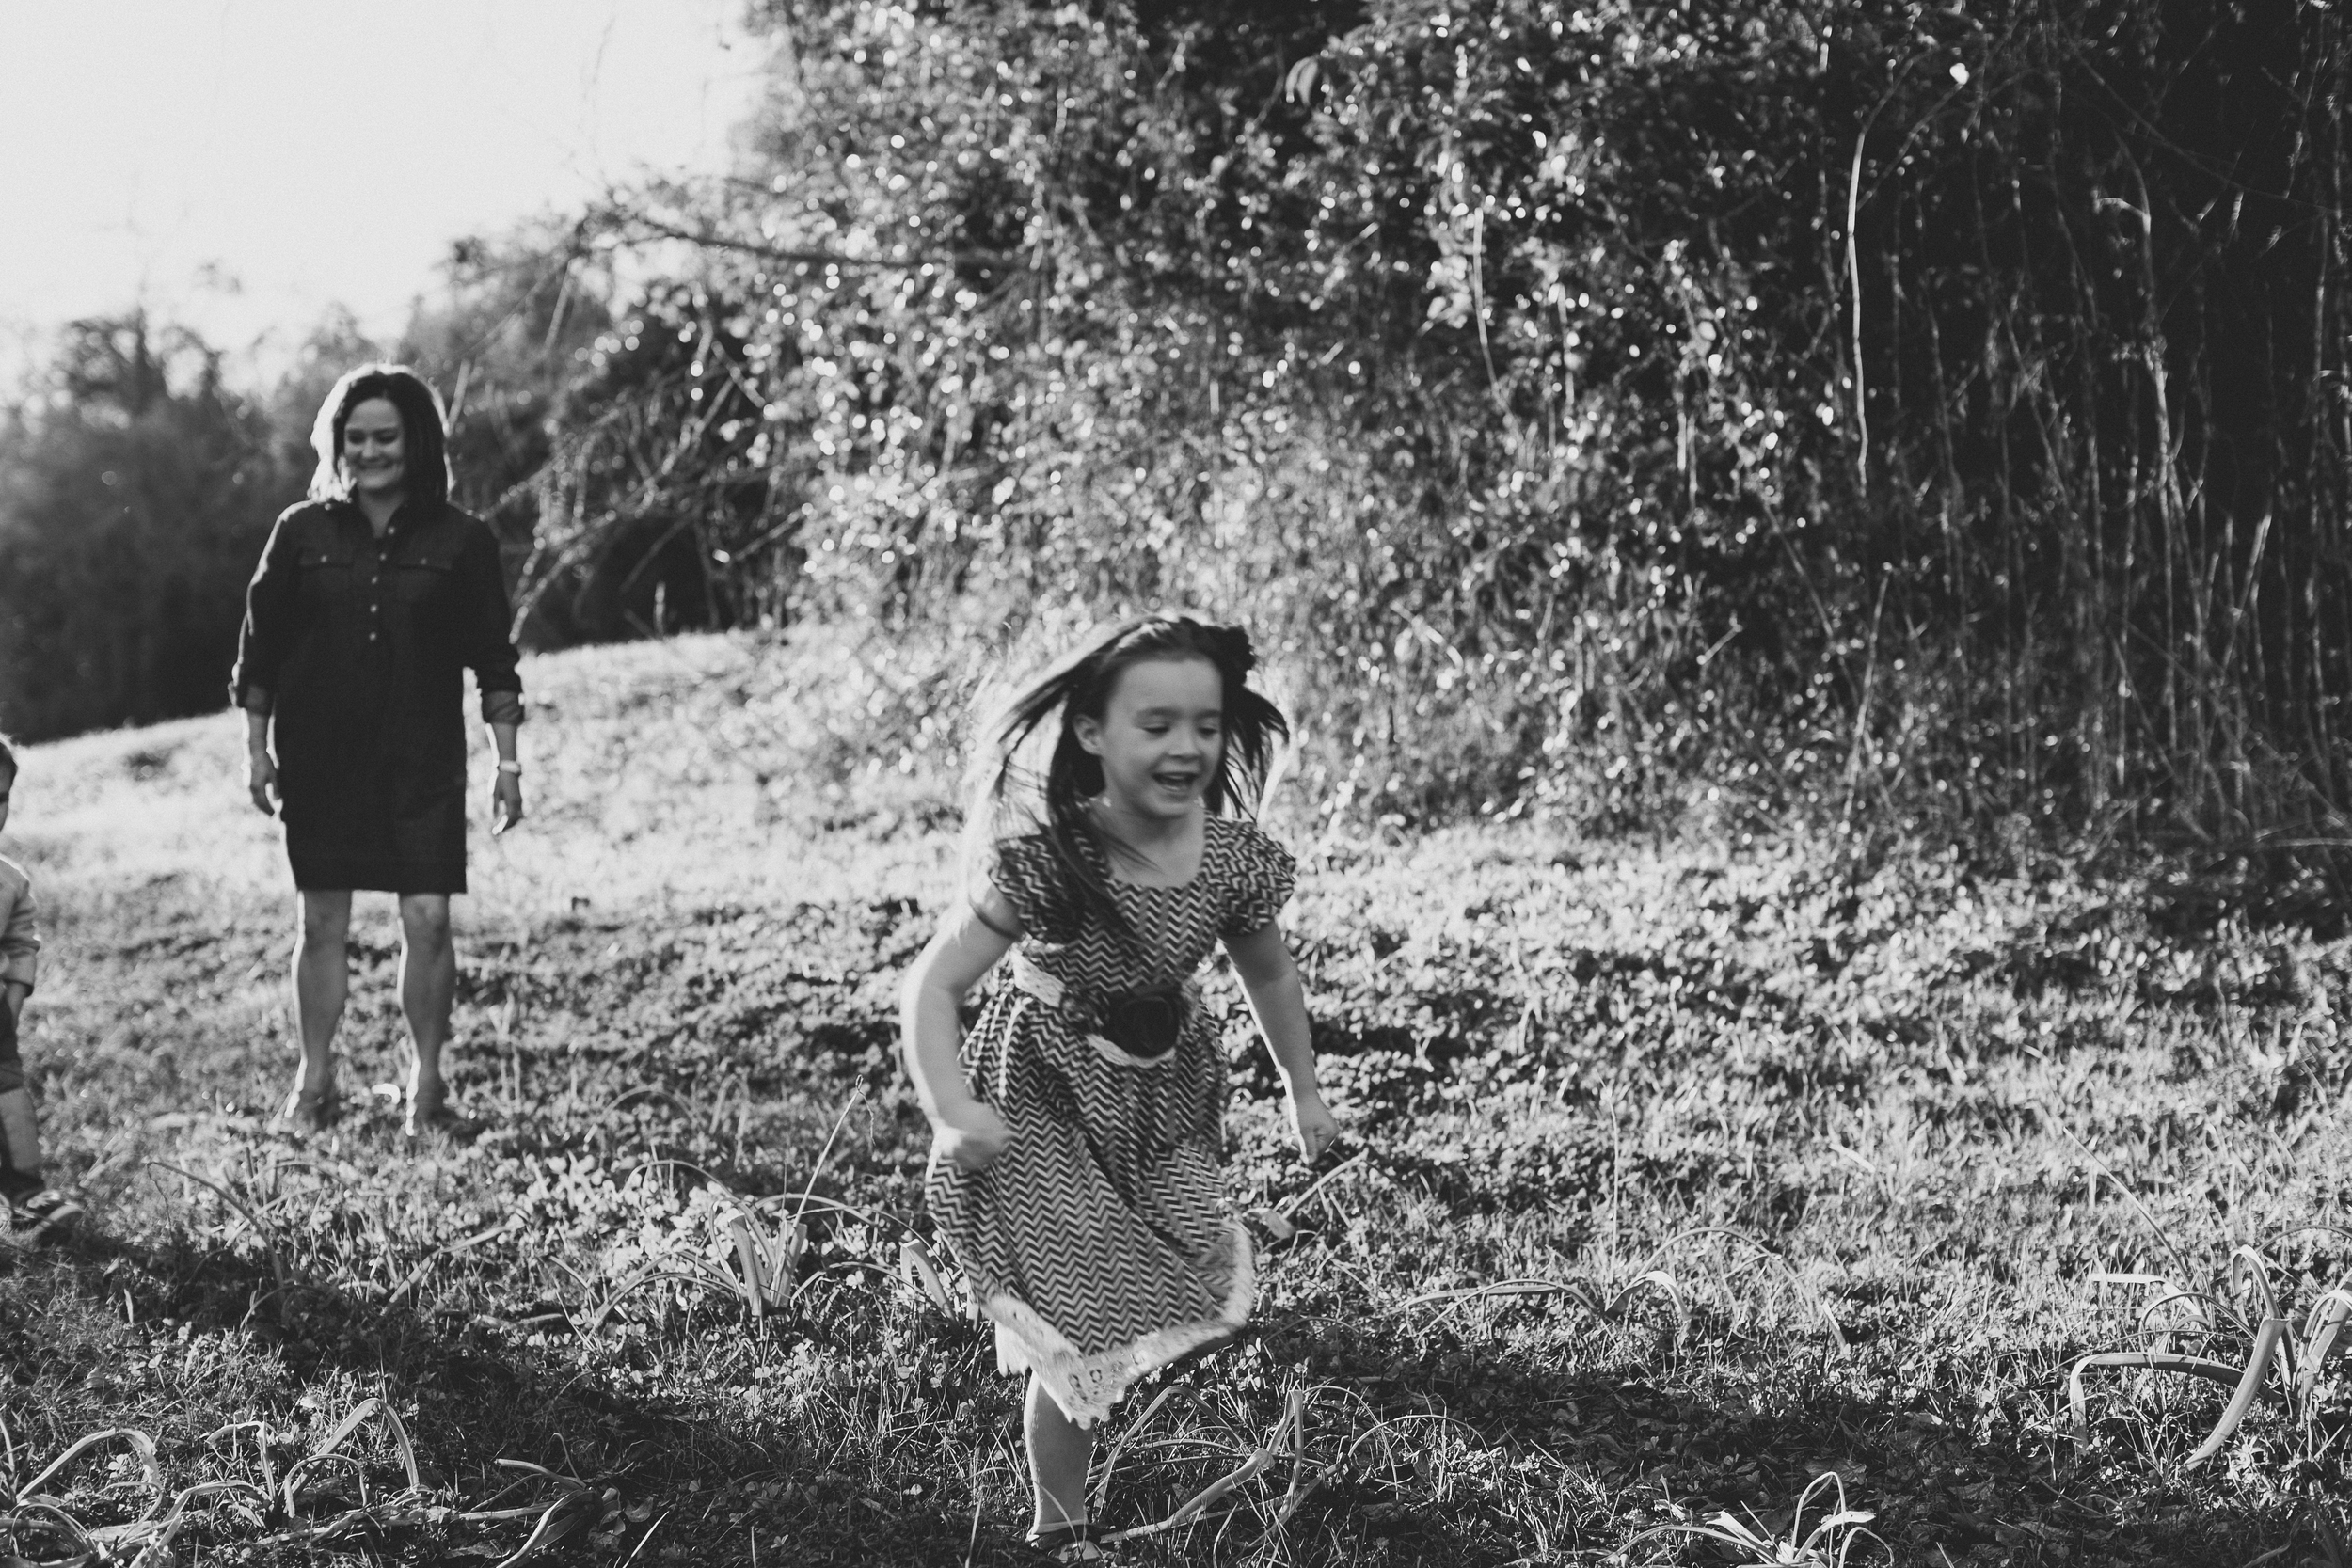 houstonfamilyphotographer_h2015_brimberry_bw-26.jpg